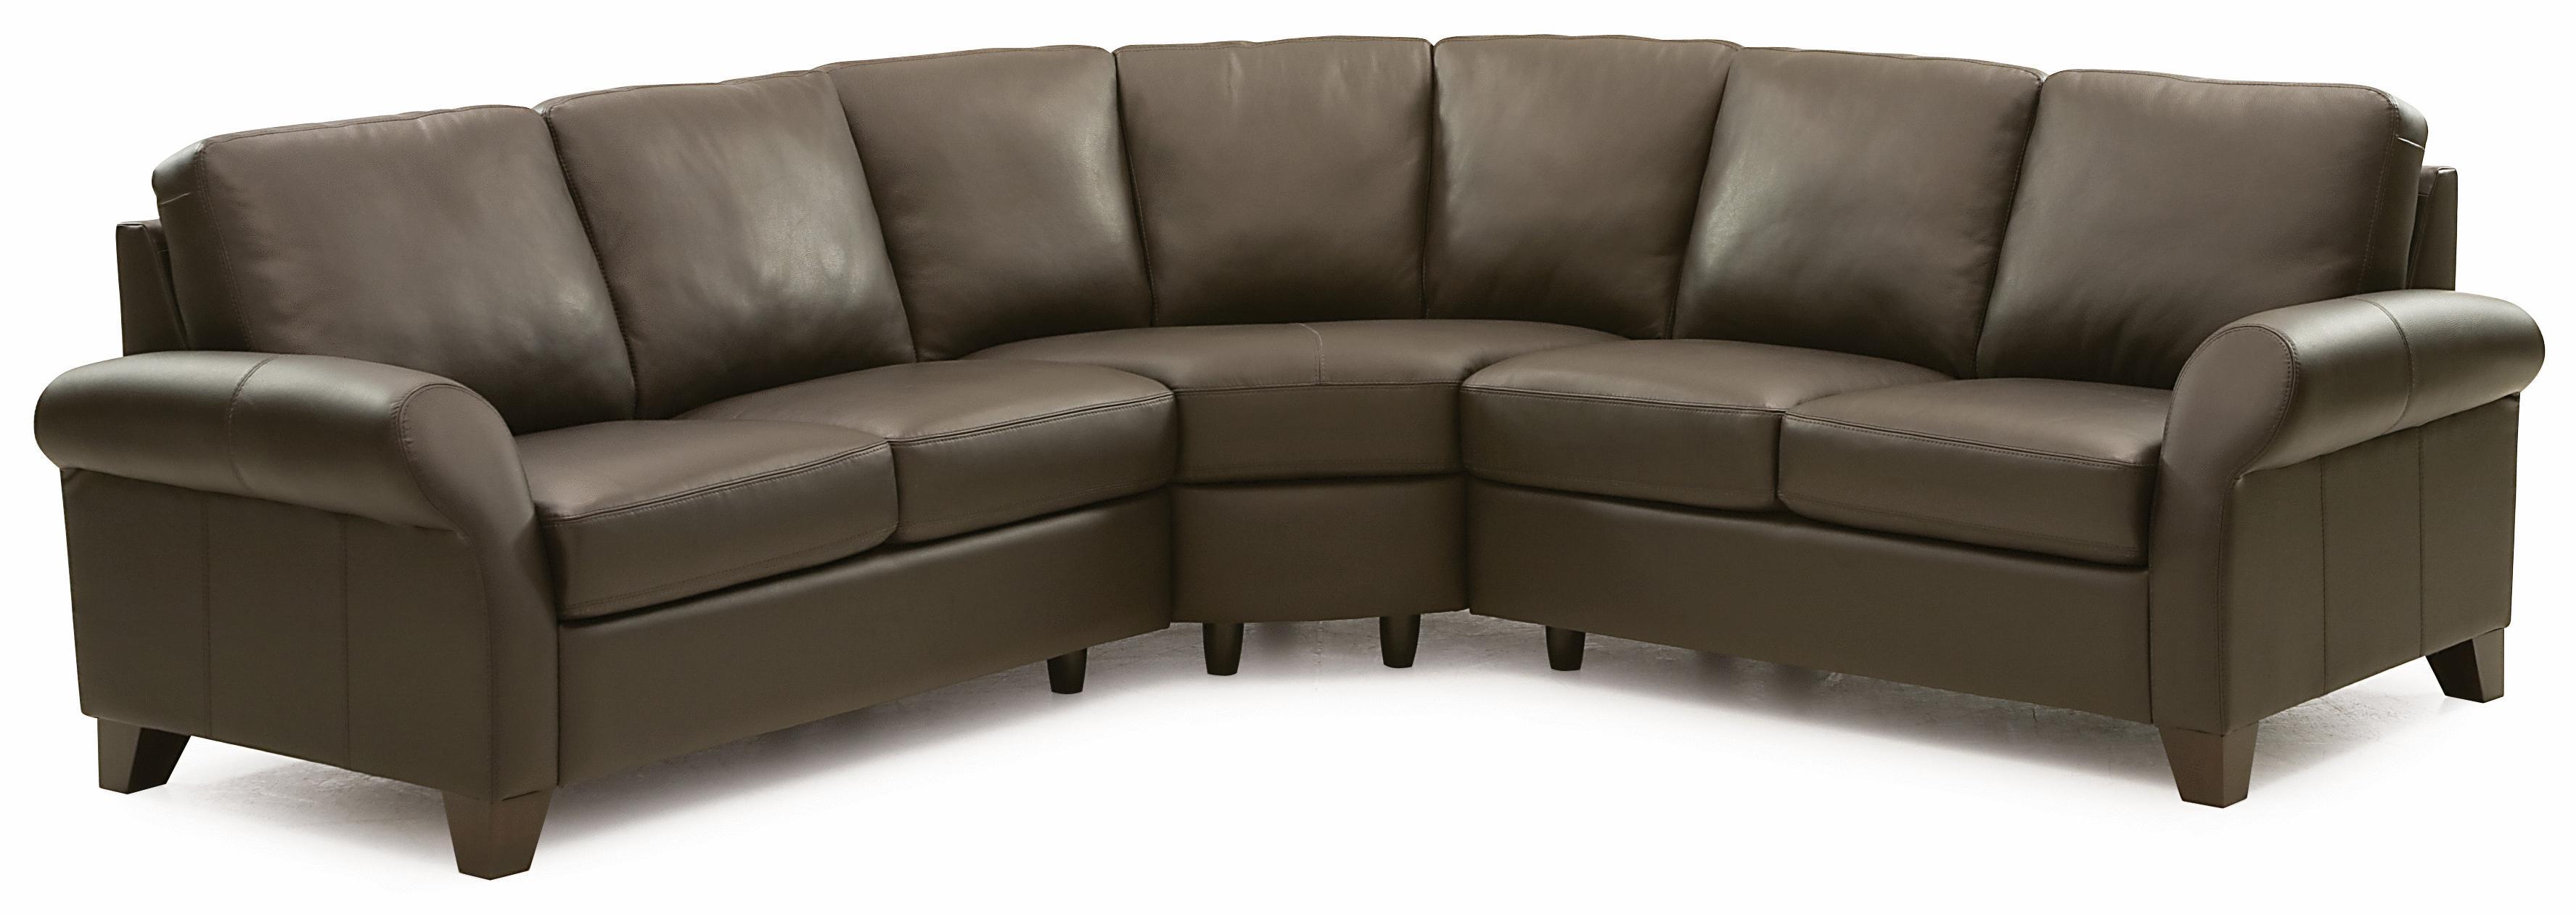 Ottawa 3 pc. Sectional by Palliser at Mueller Furniture